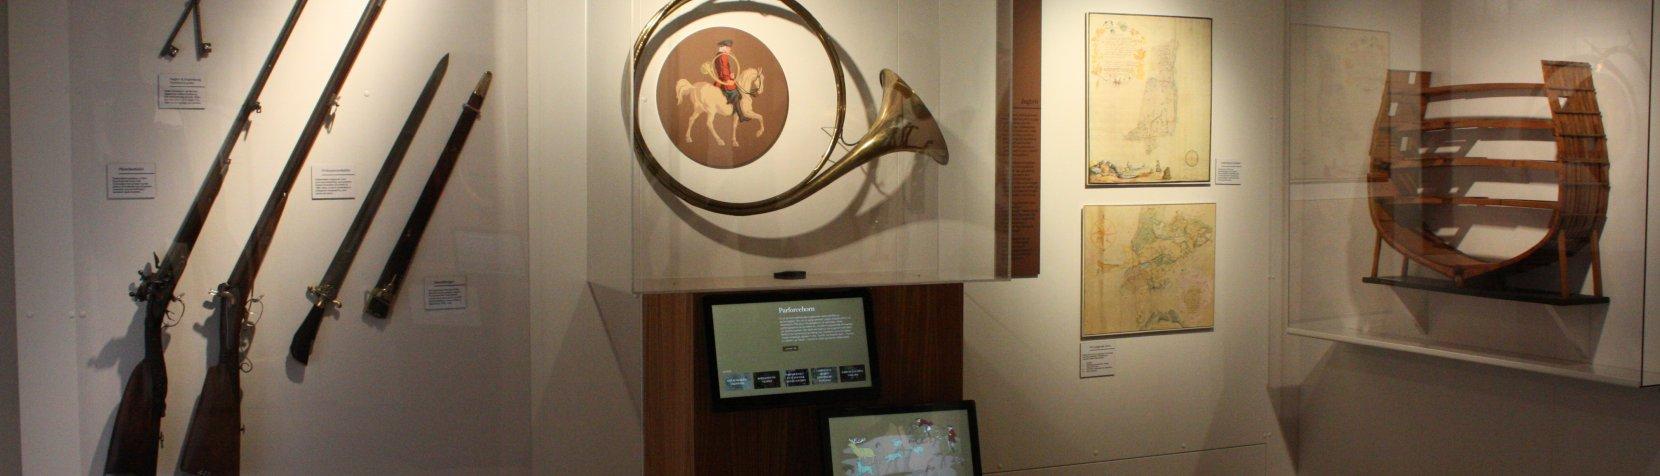 Jordrummet i Mothsgårdens udstilling